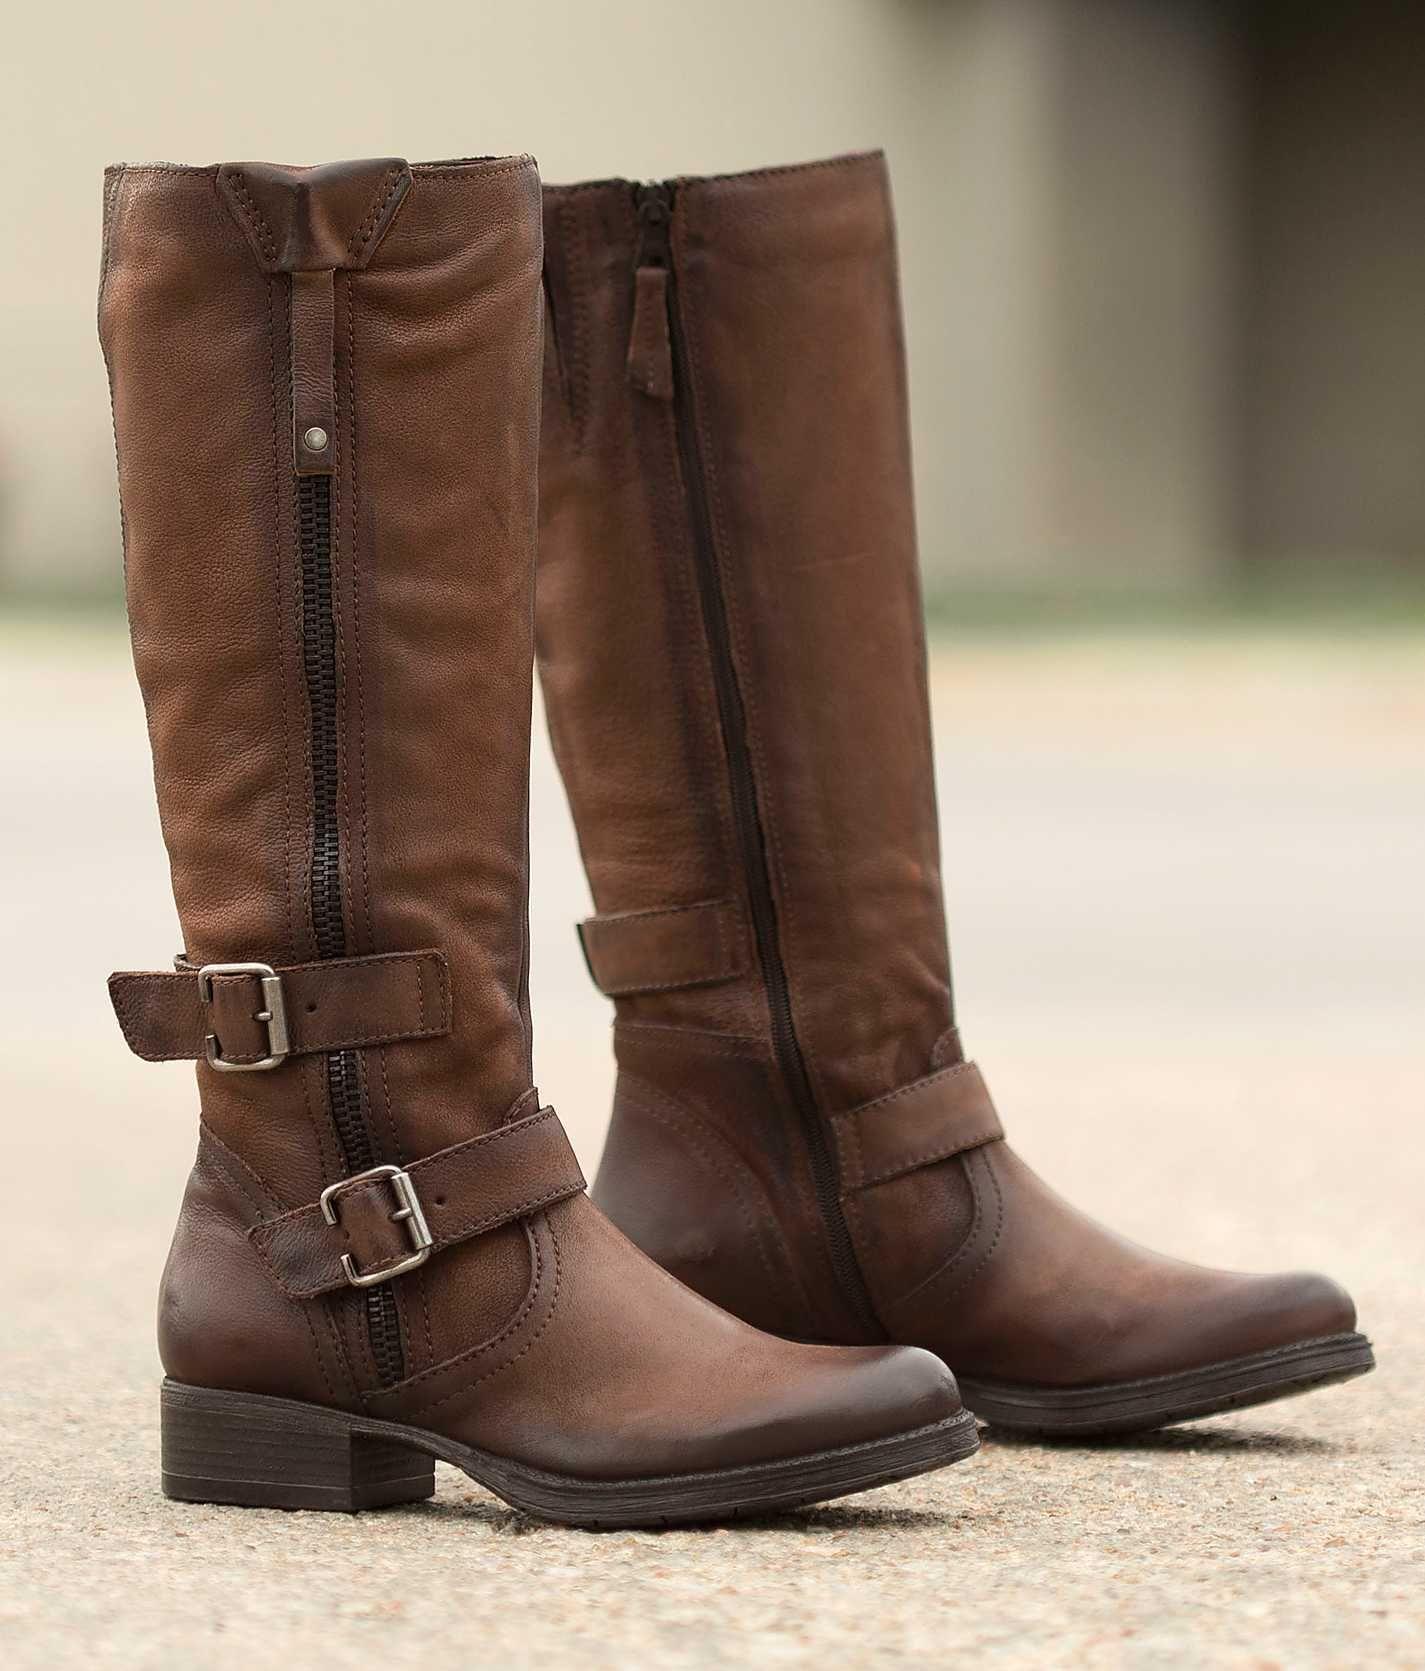 Miz Mooz Holden Boot - Women's Shoes in Chestnut